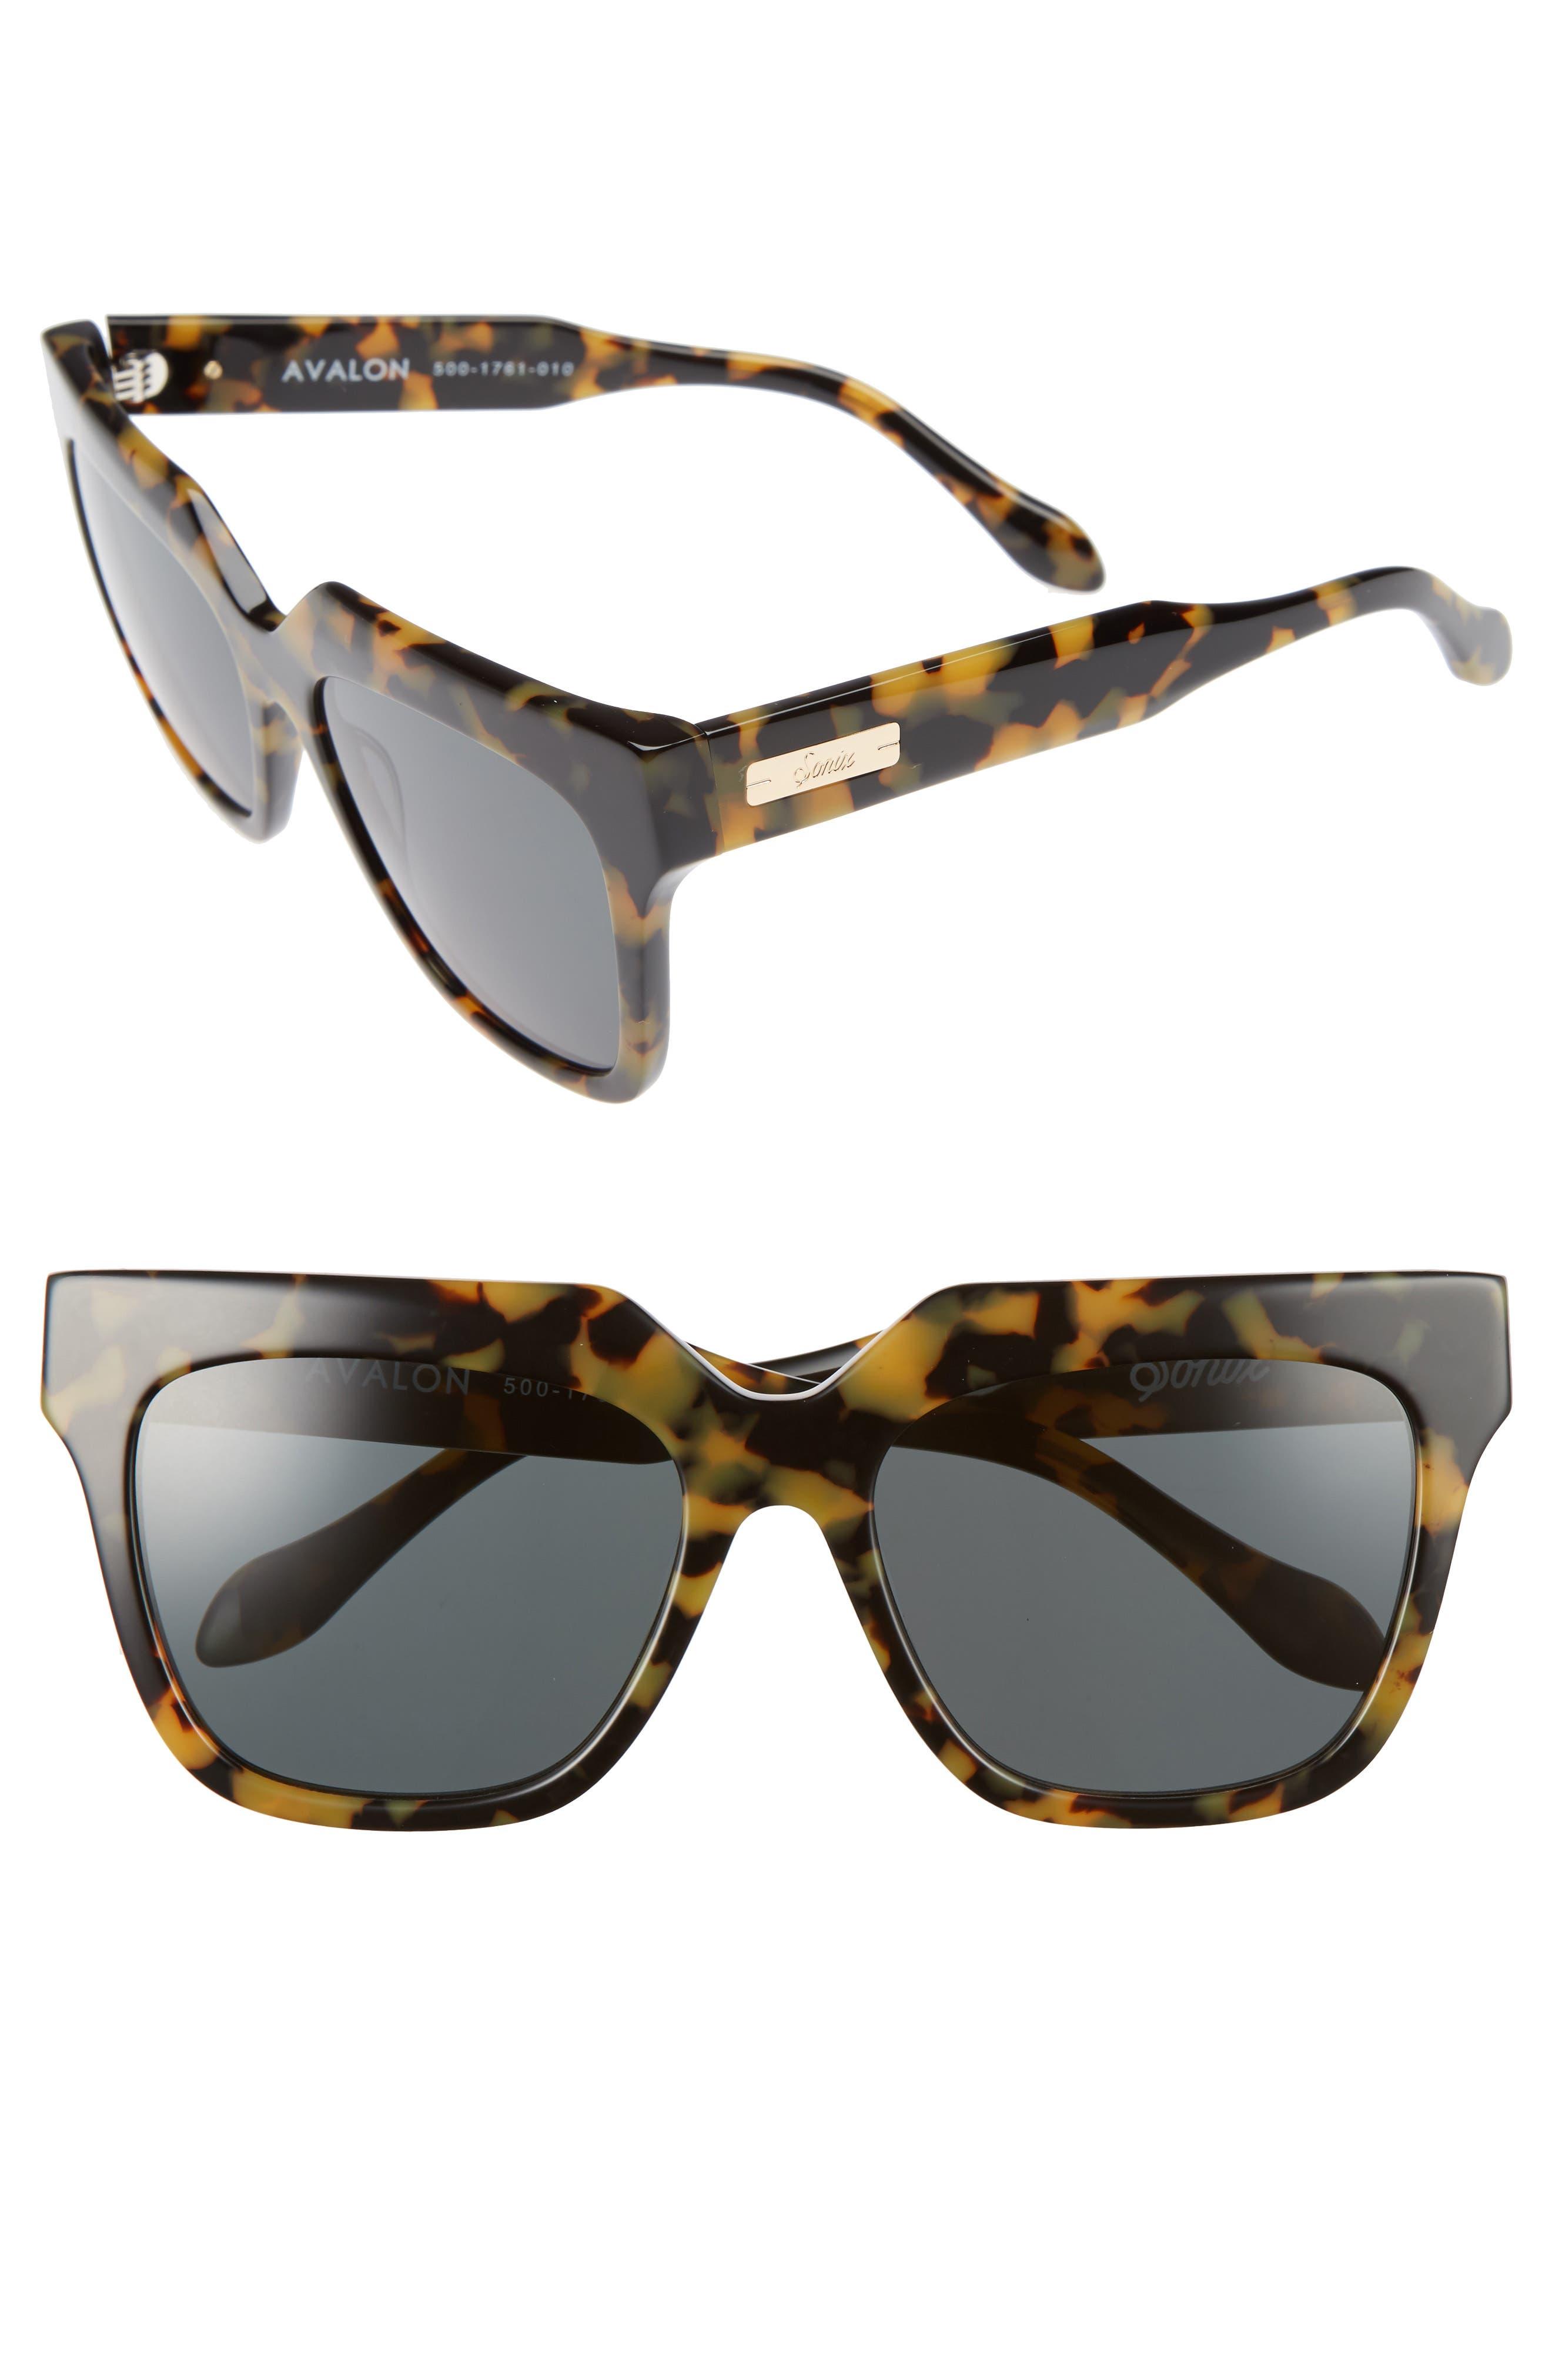 SONIX Avalon 57mm Retro Sunglasses